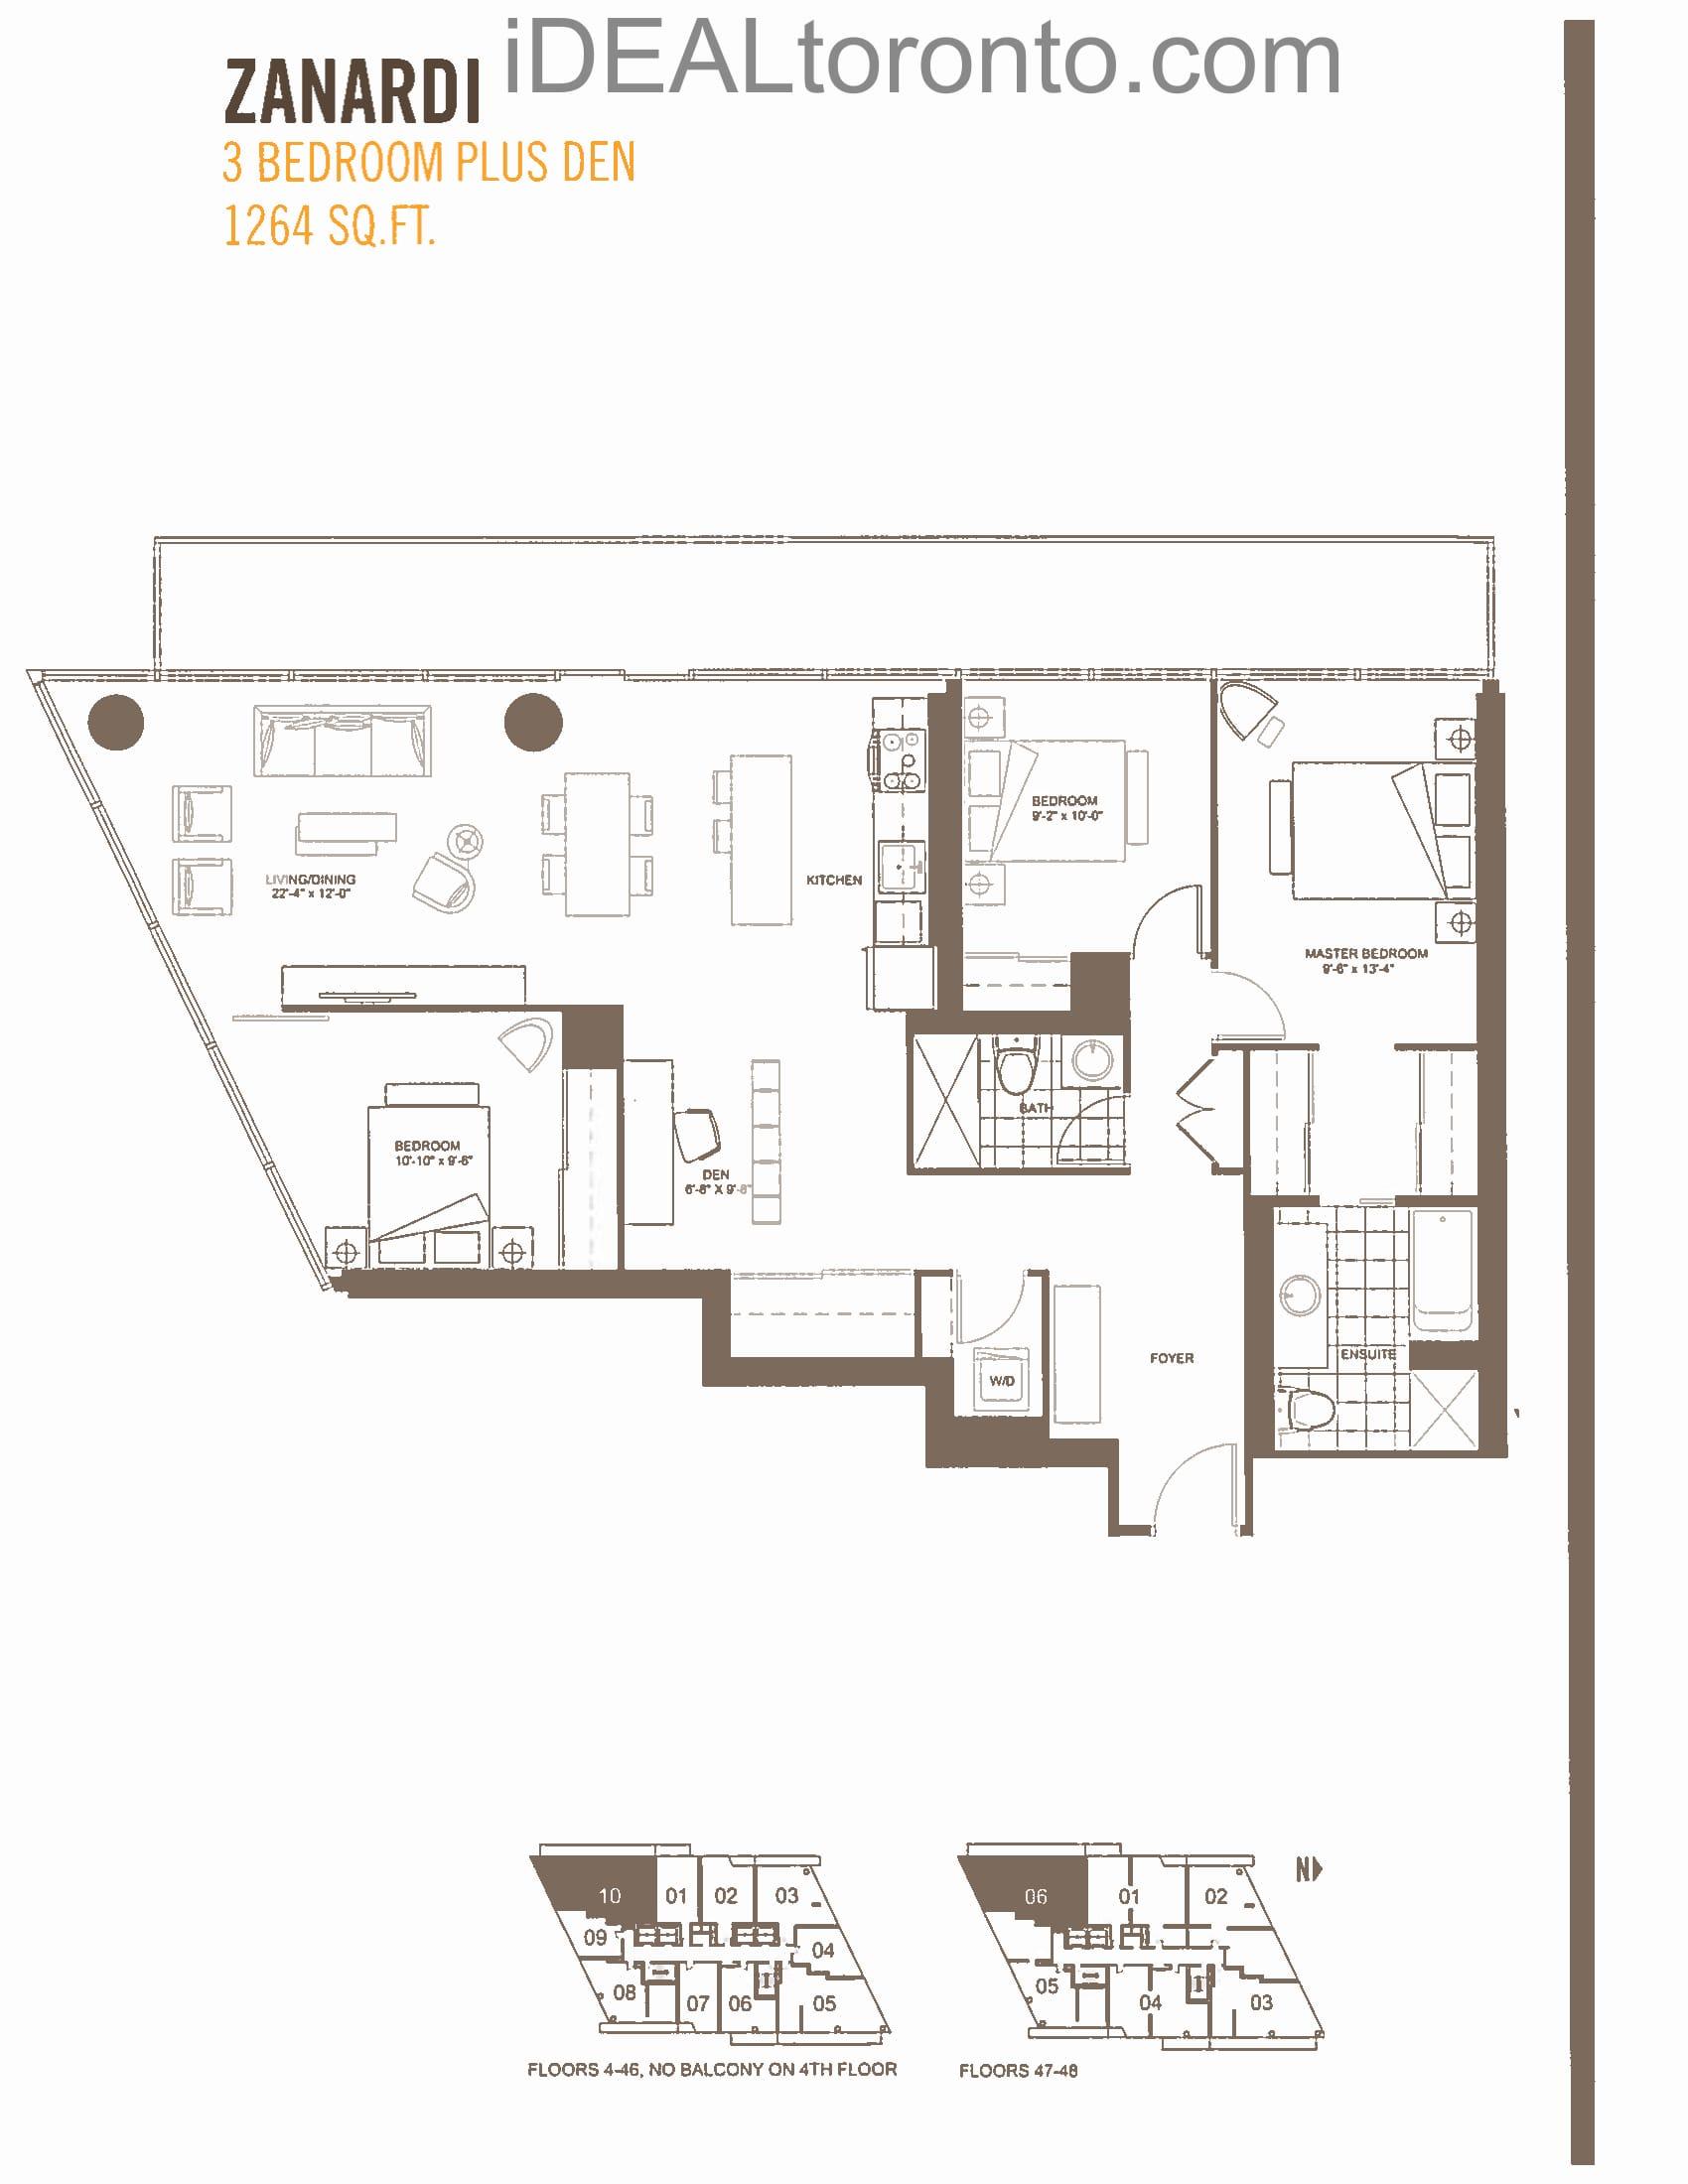 Zanardi: 3+1 Bedroom,SW, 1264 SqFt